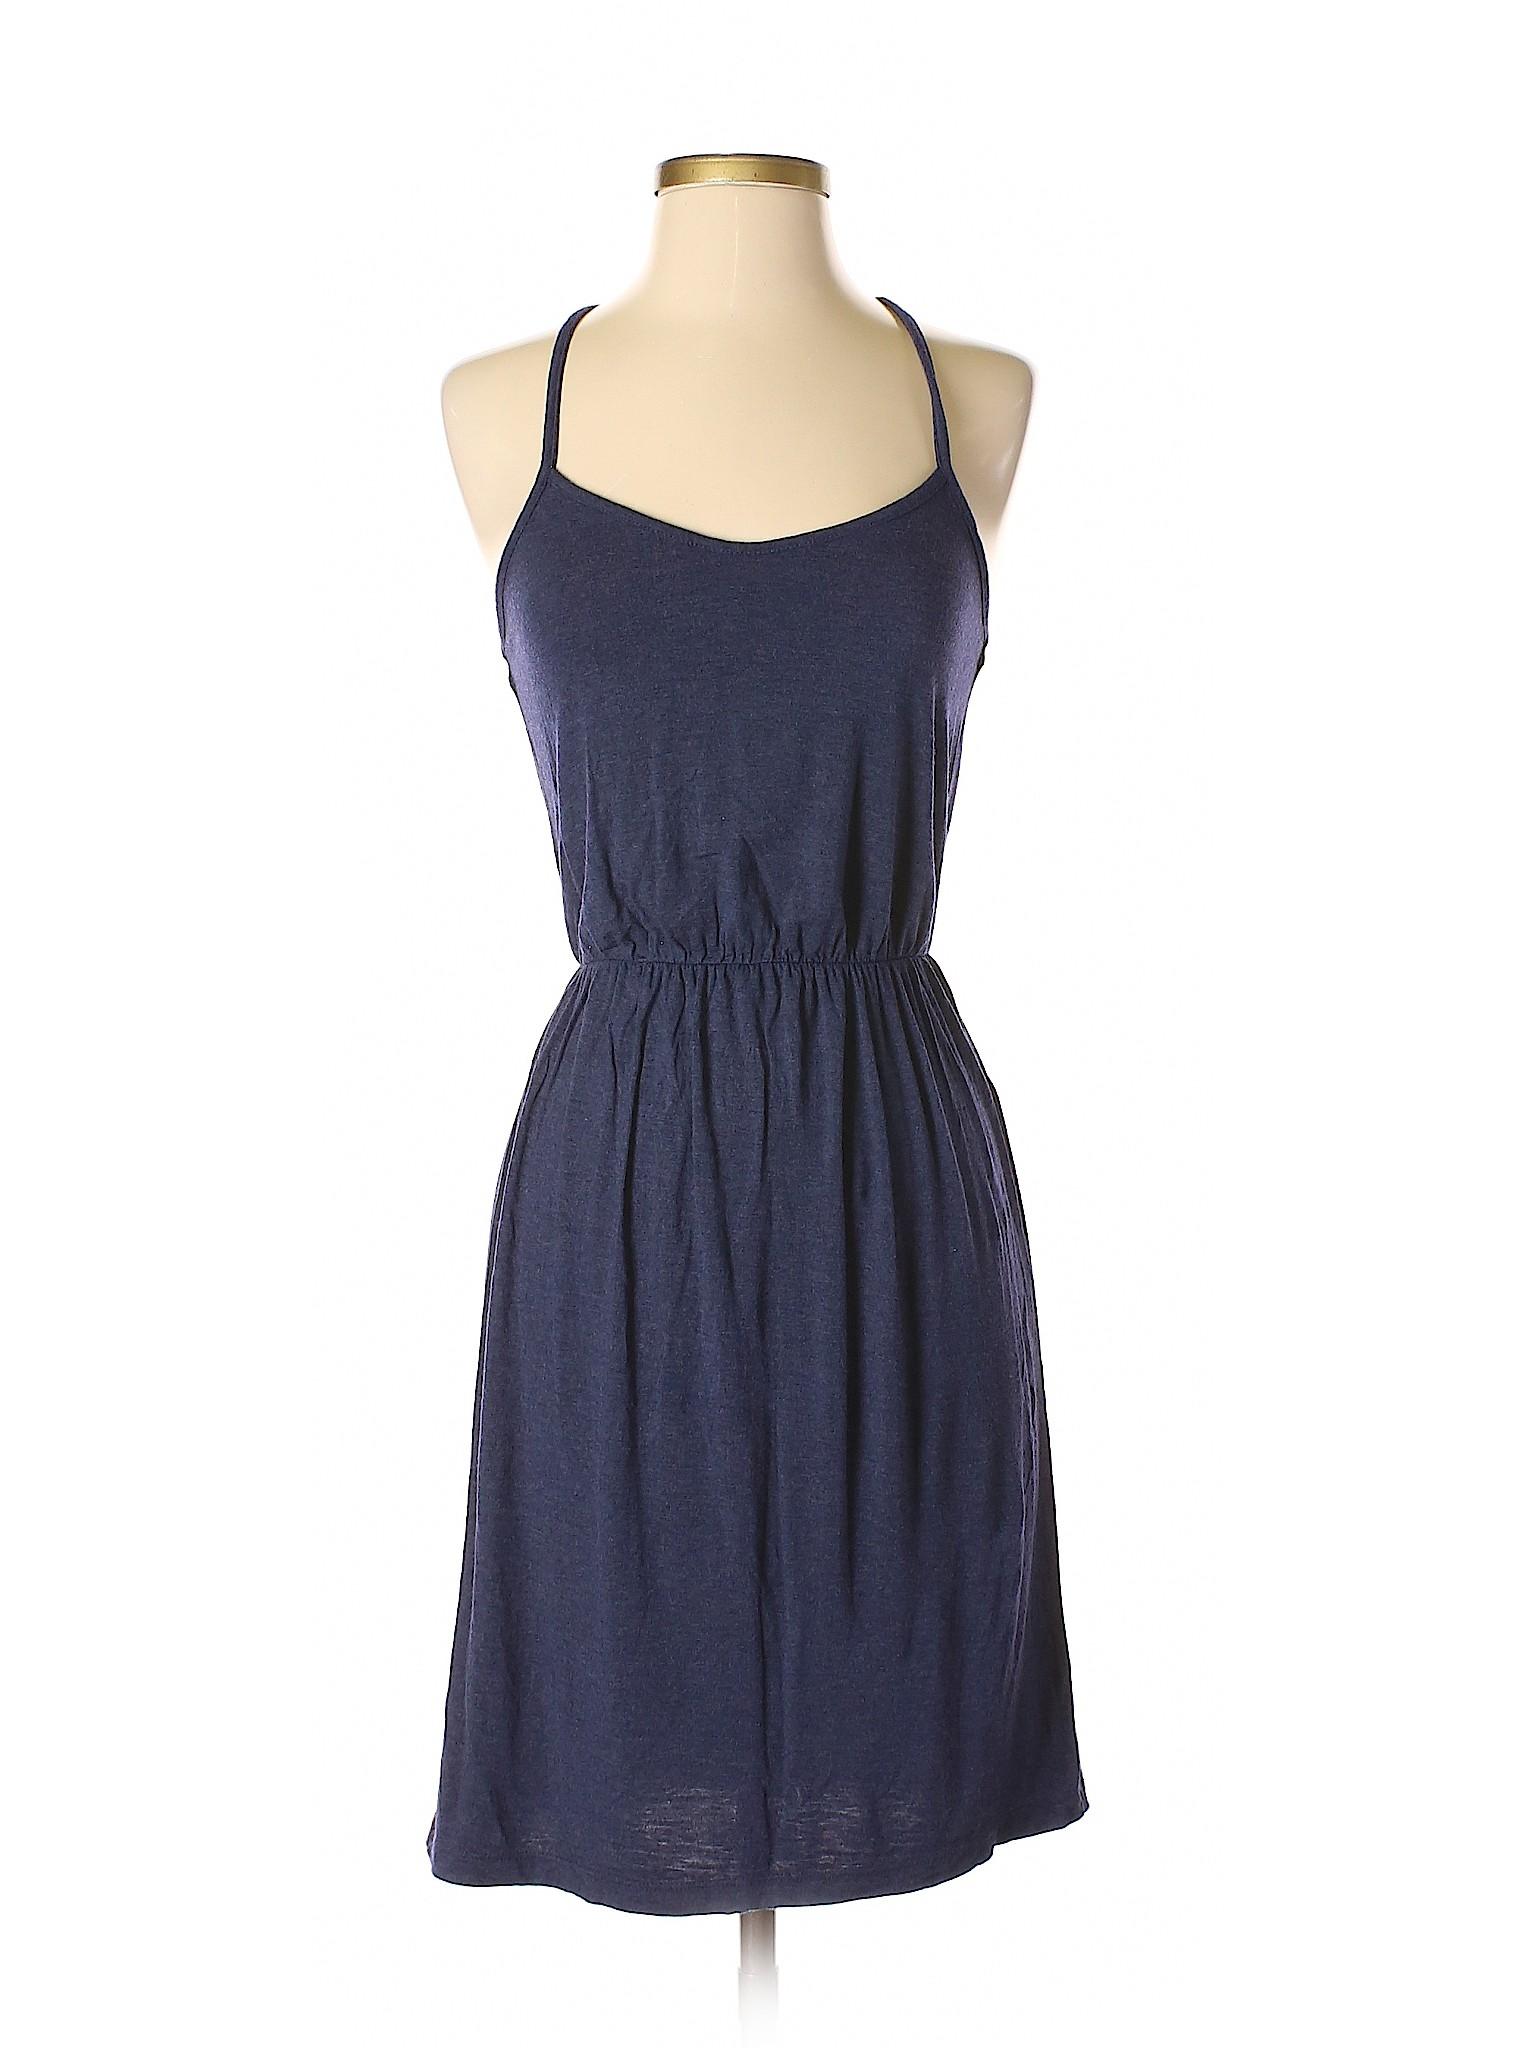 Dress Ann Taylor LOFT Selling Casual aOqIA